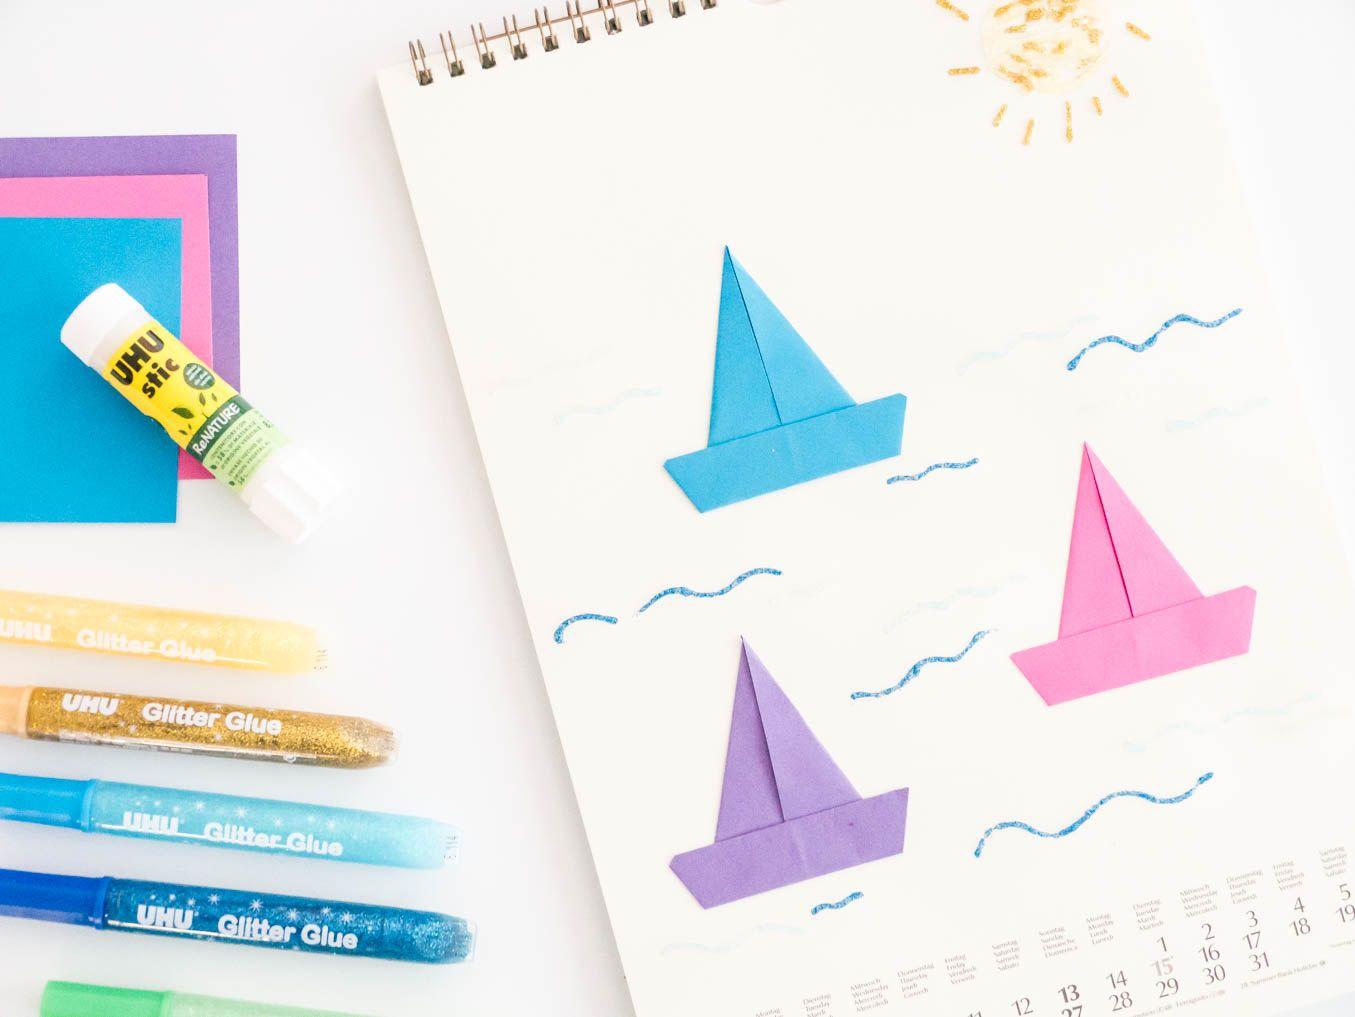 Bastelkalender Ideen.Diy Bastelkalender Bastelkalender Kalender Und Kalender